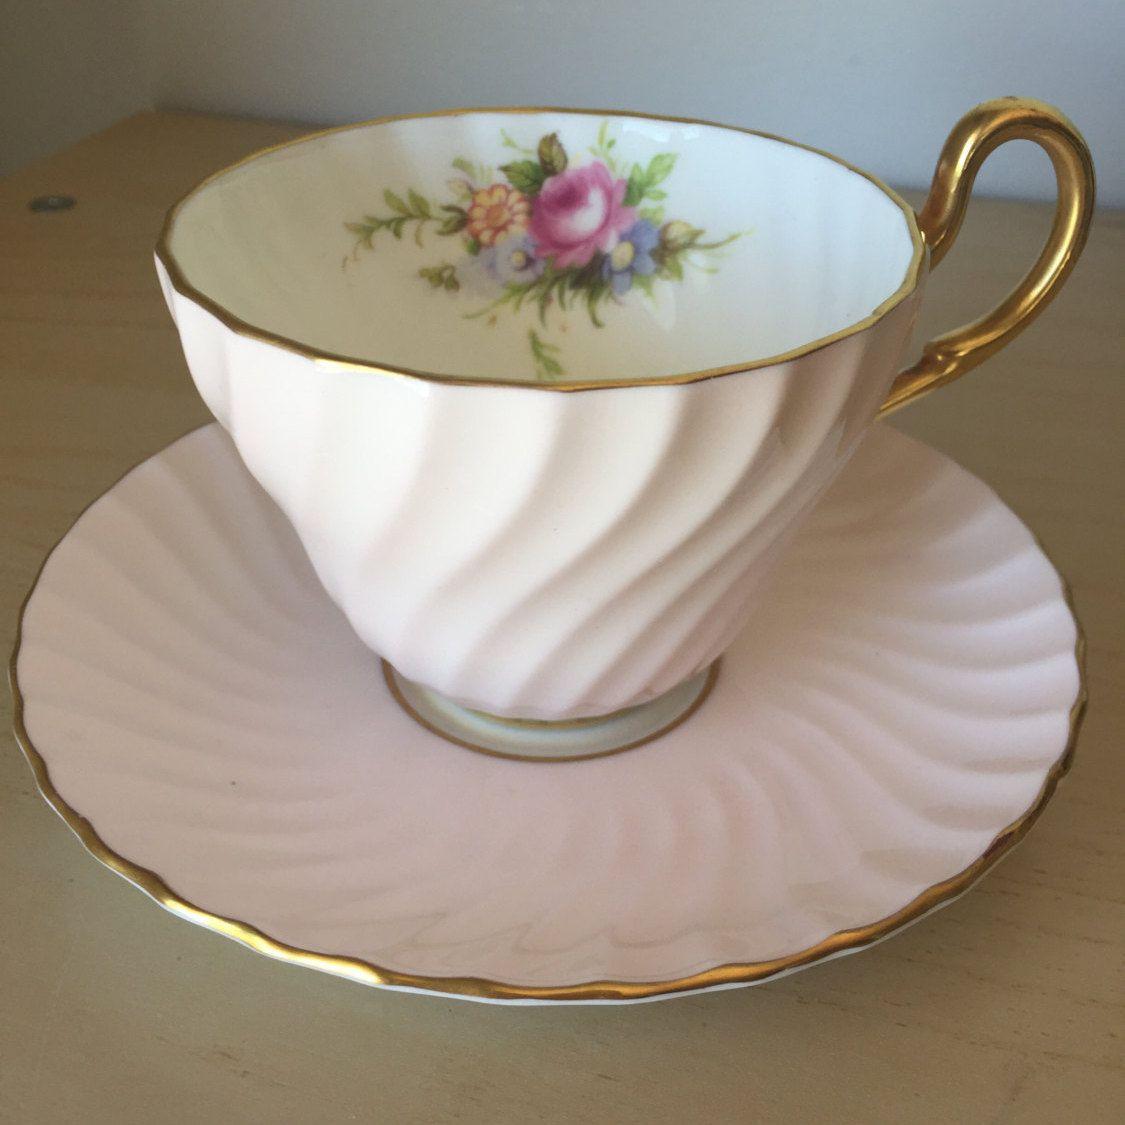 E B Foley Vintage Teacup and Saucer Light Pink Flower Bouquet Tea